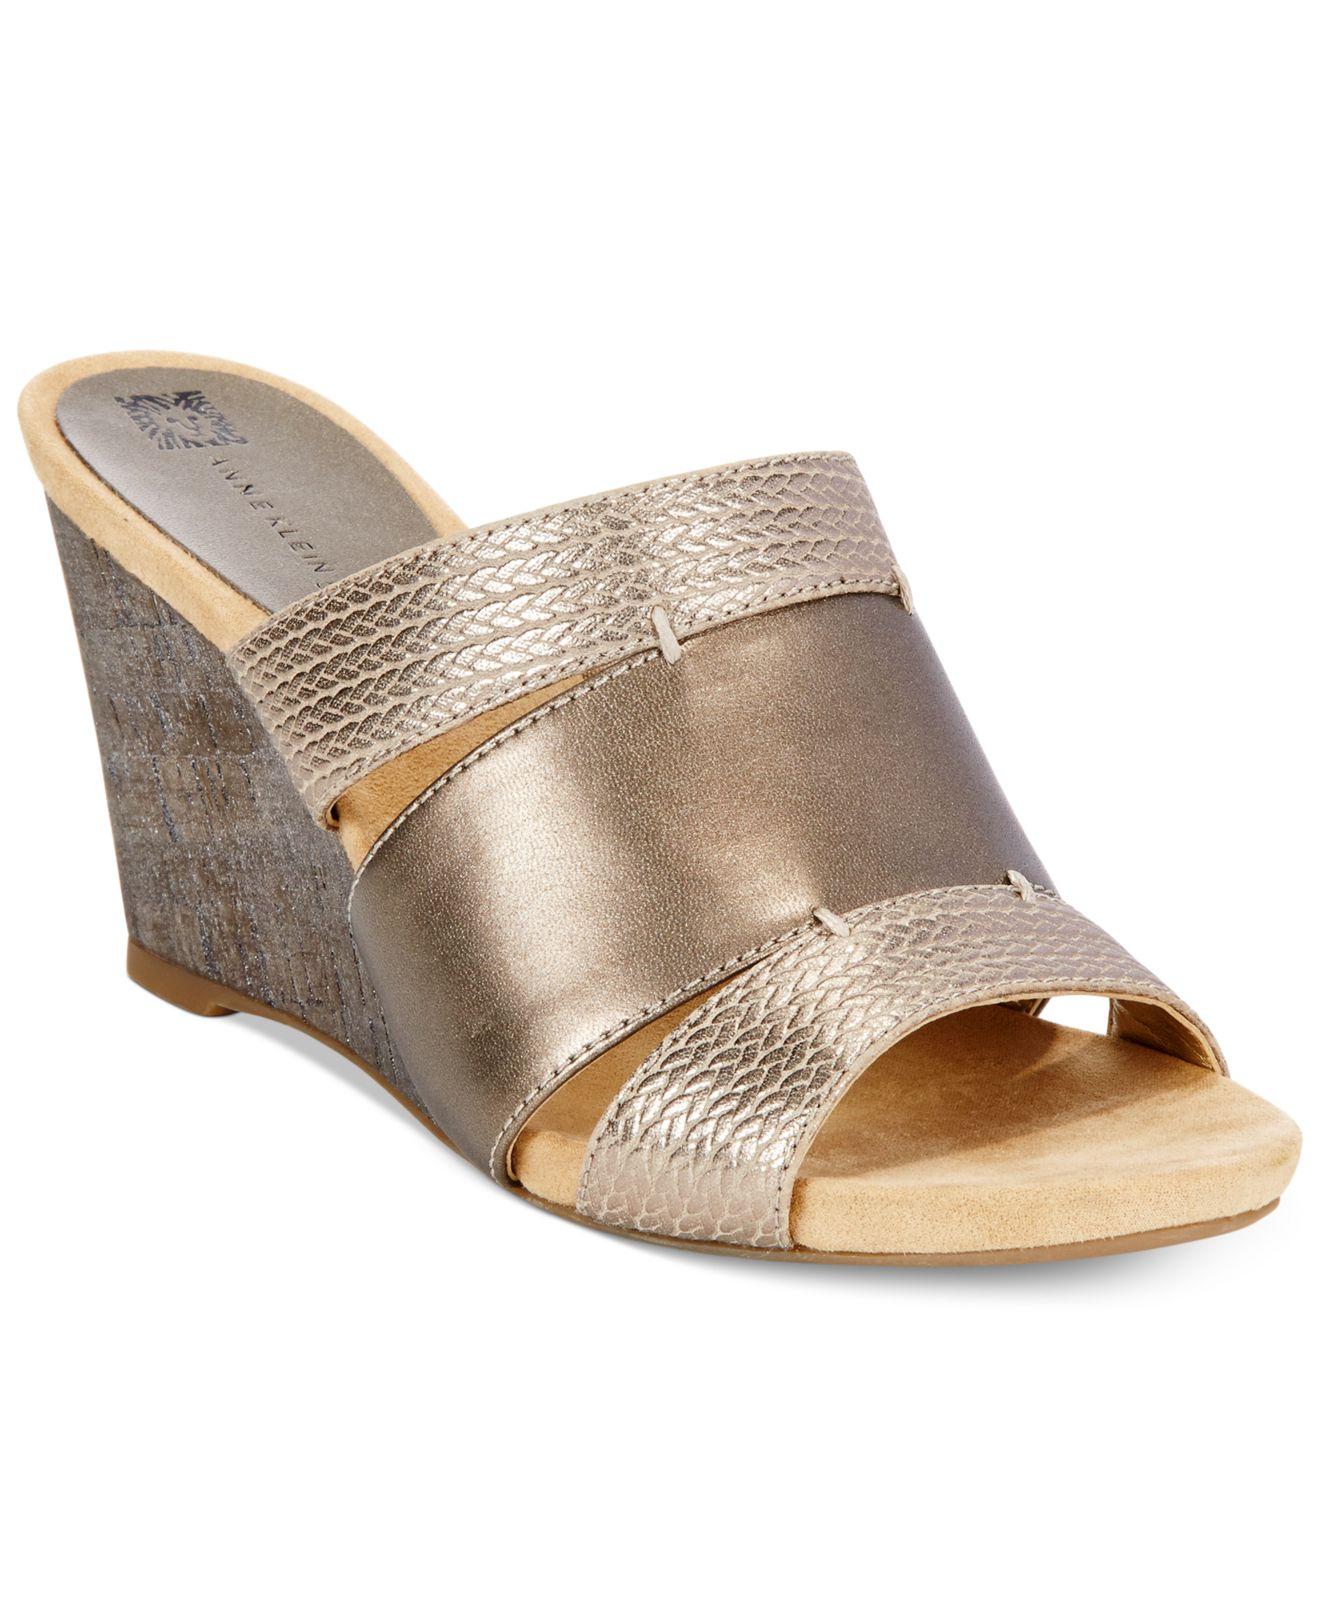 3c70ef59505 Lyst - Anne Klein Loopy Wedge Sandals in Metallic